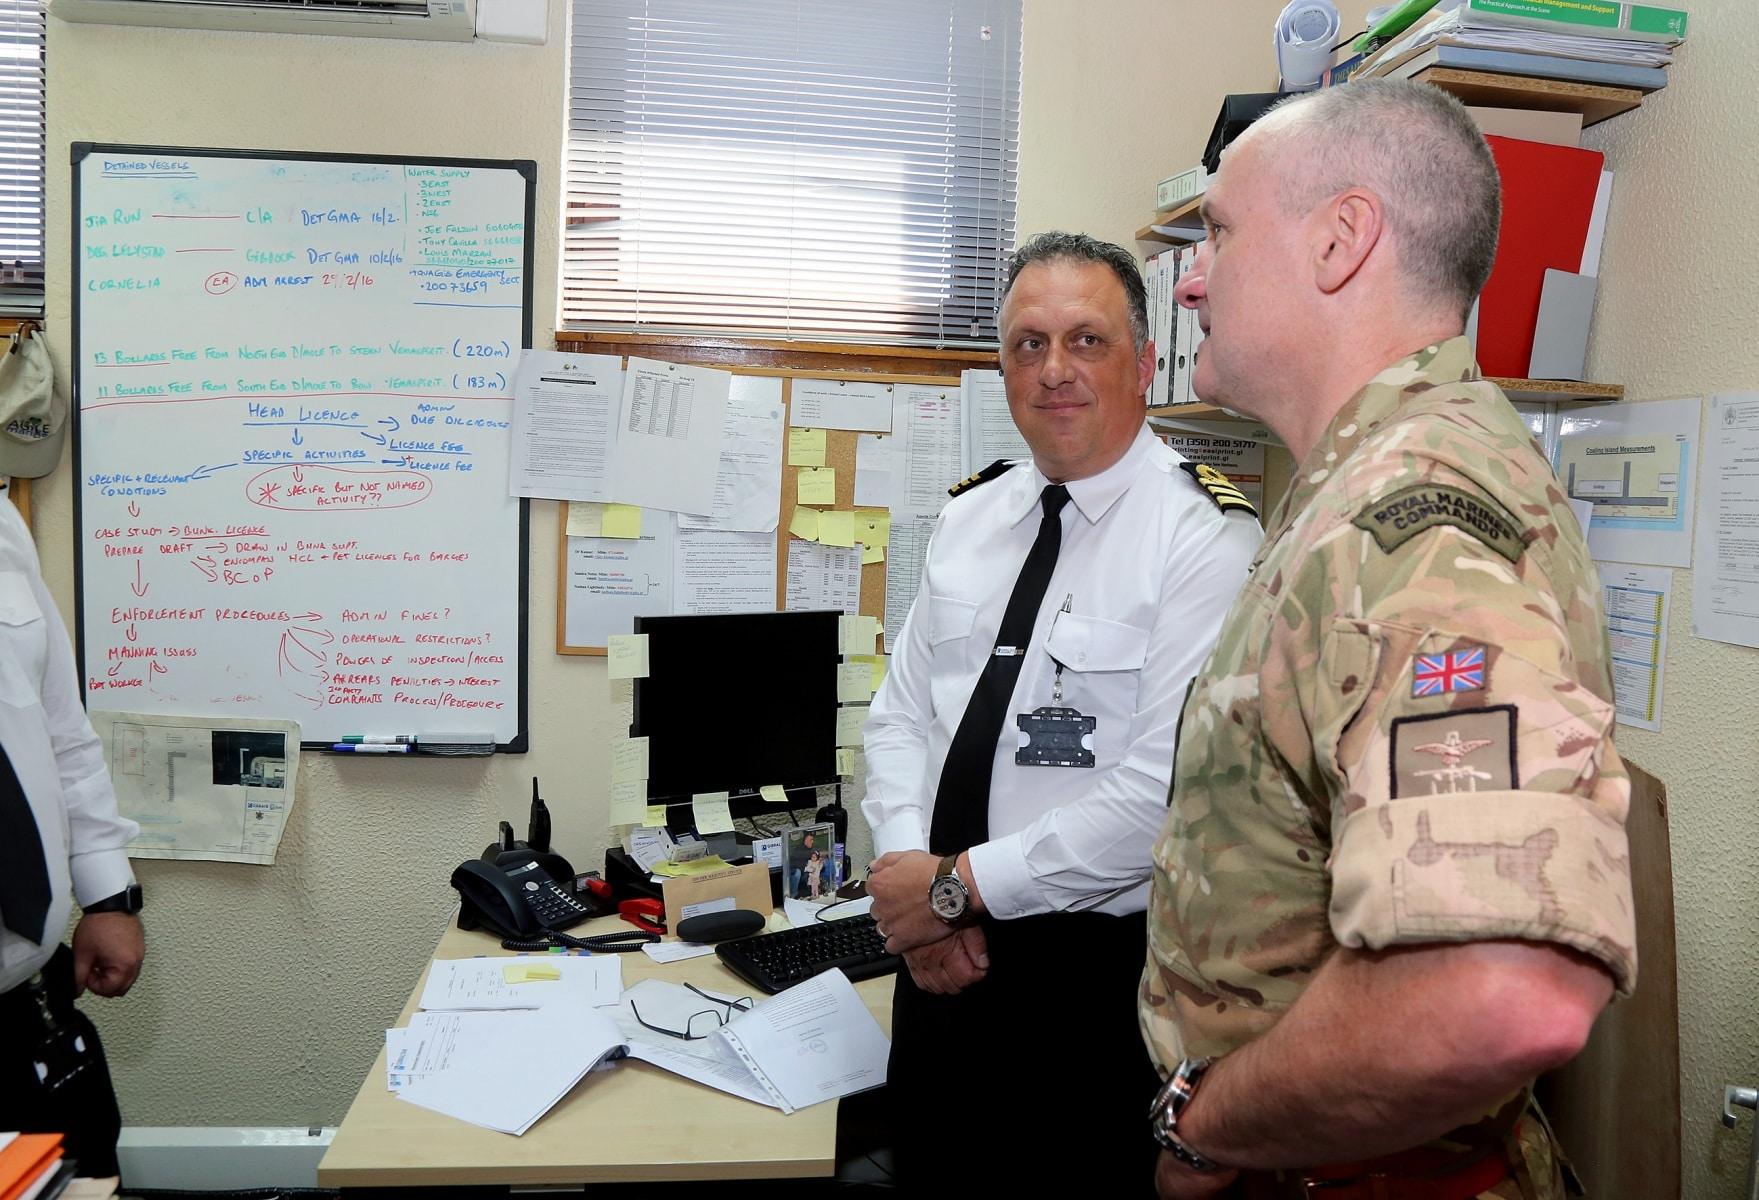 visita-oficial-del-gobernador-al-puerto-de-gibraltar_26154508205_o